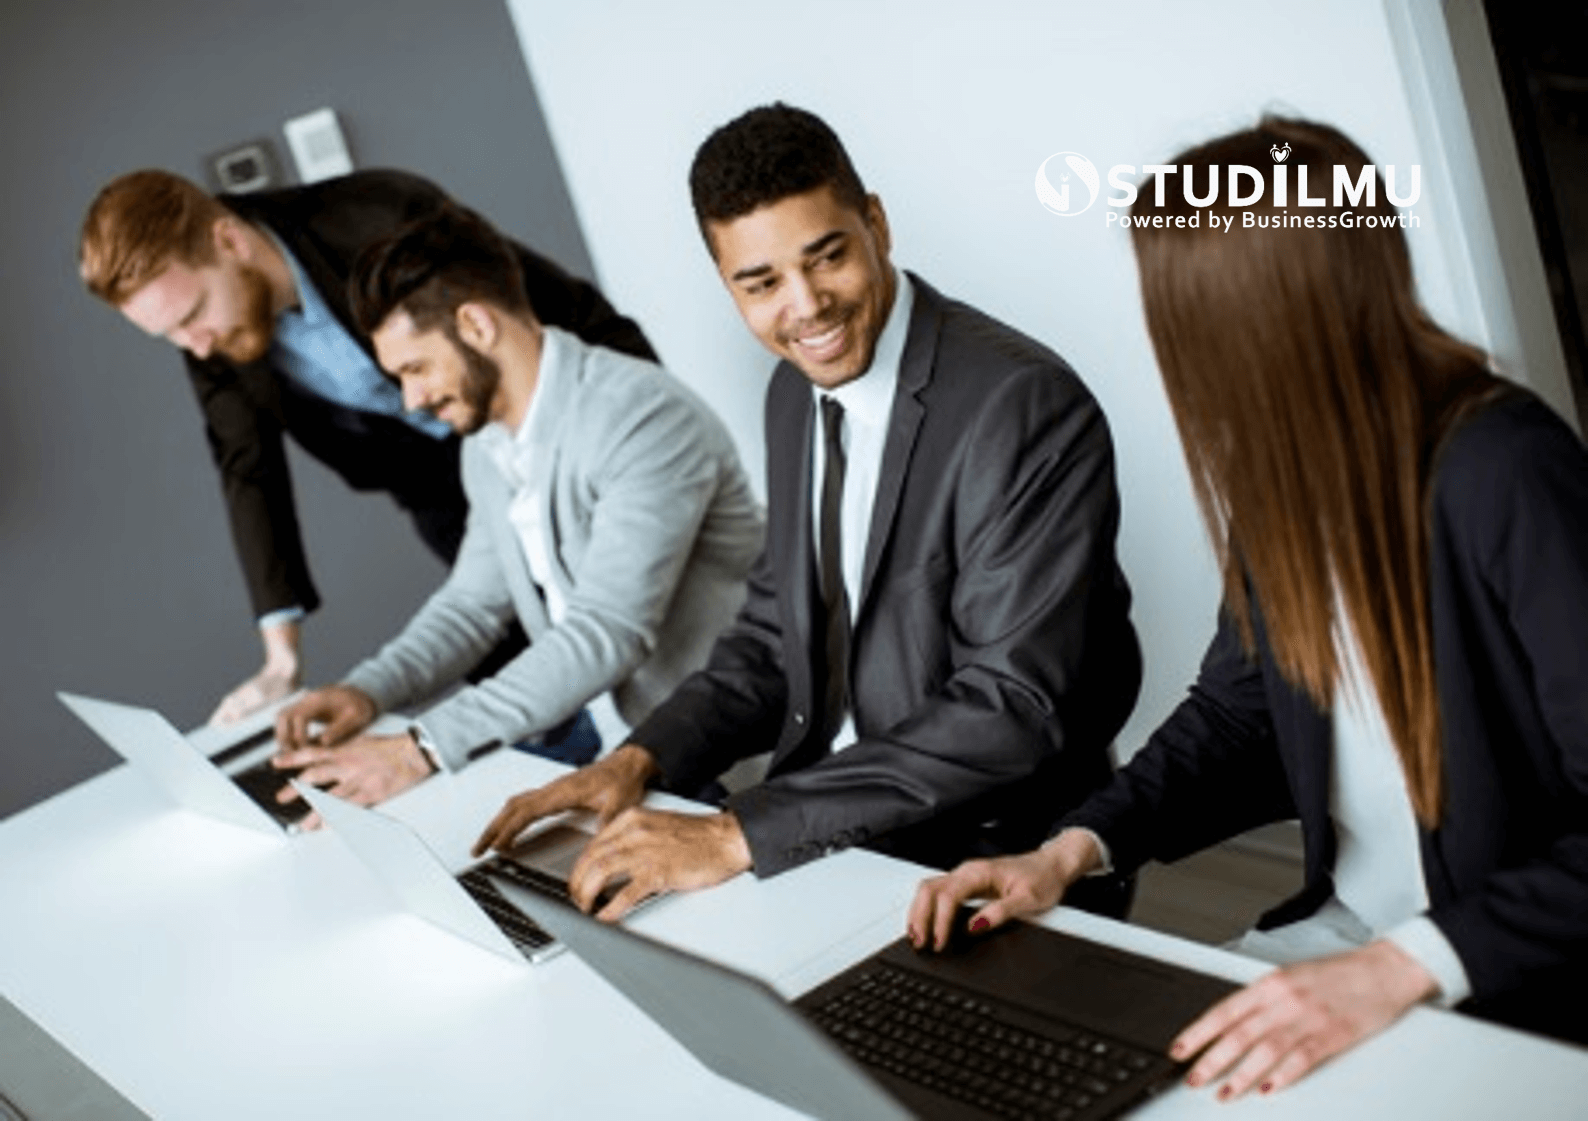 STUDILMU Career Advice - Bagaimana Mengubah Proses Pemasaran Produk Menjadi Lebih Baik?